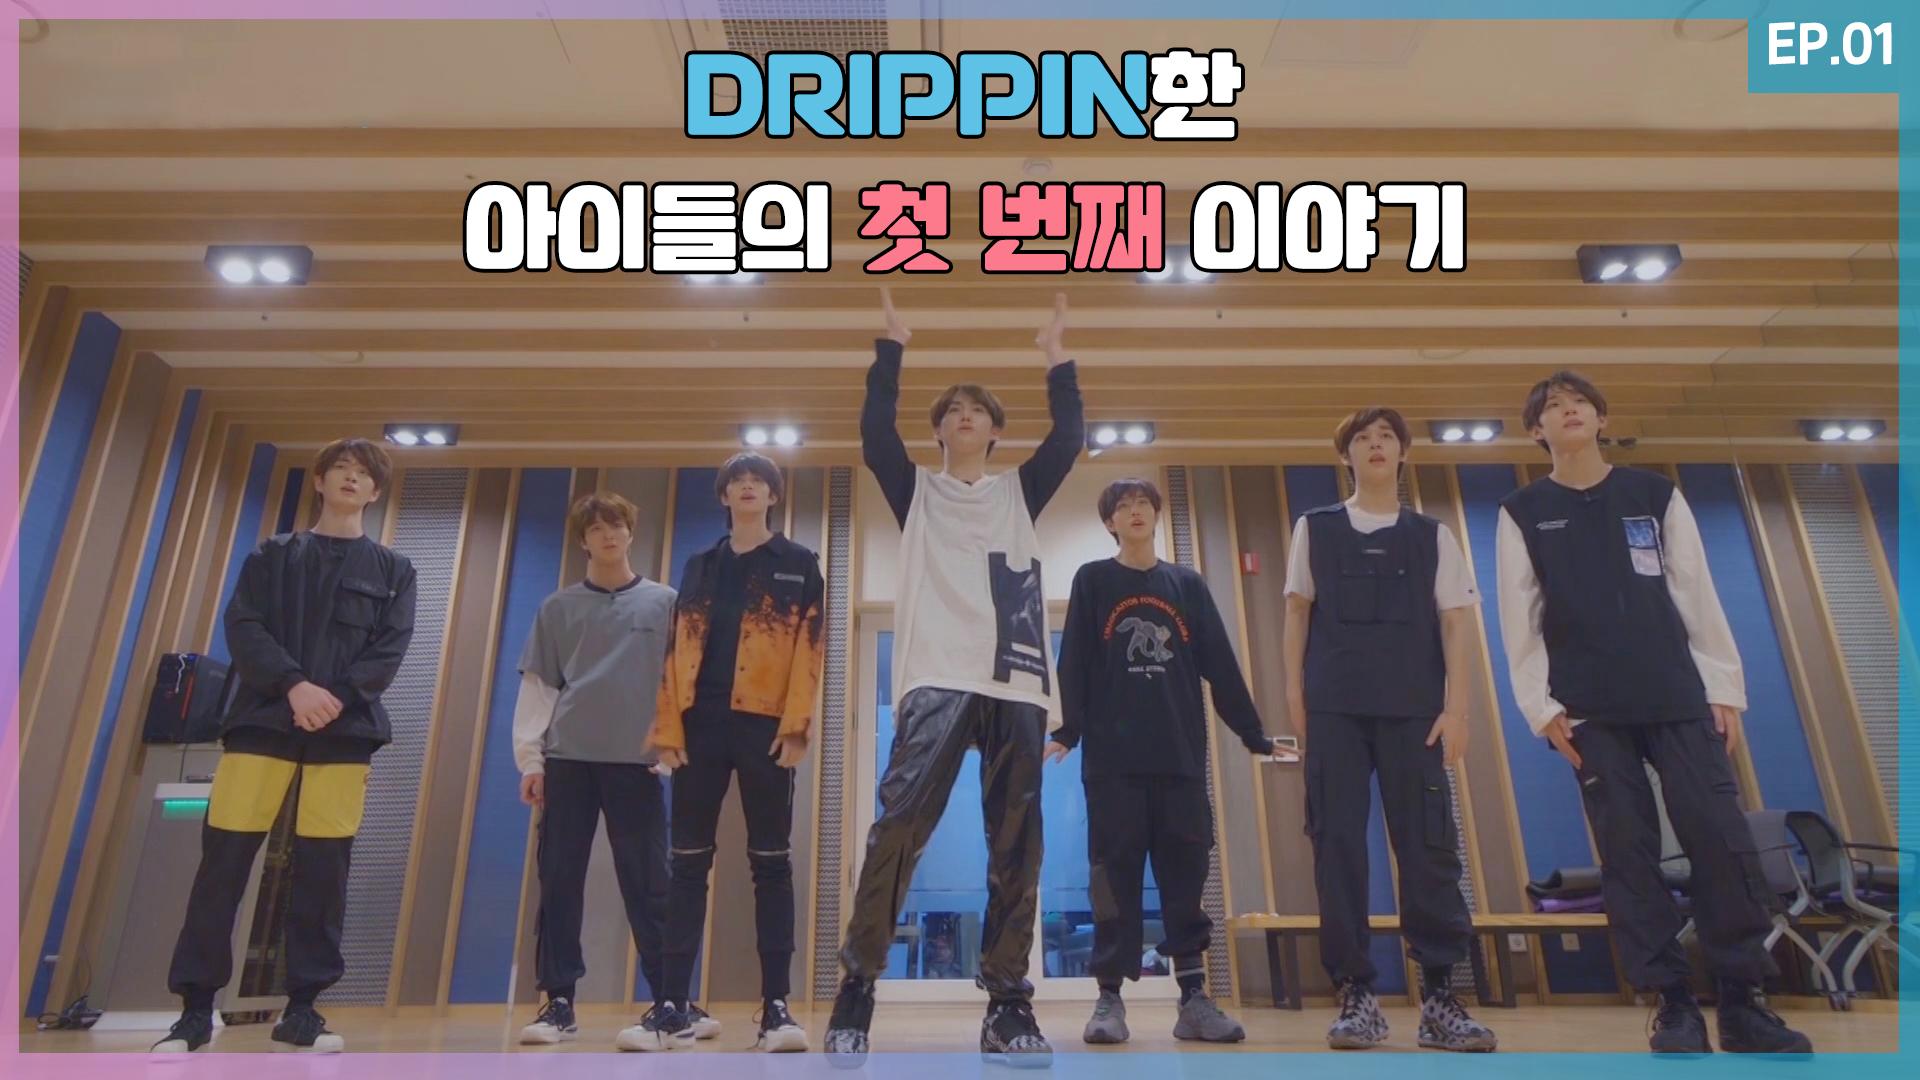 DRIPPIN한 아이들의 첫 번째 이야기 📝 WE ARE DRIPPIN! EP.1